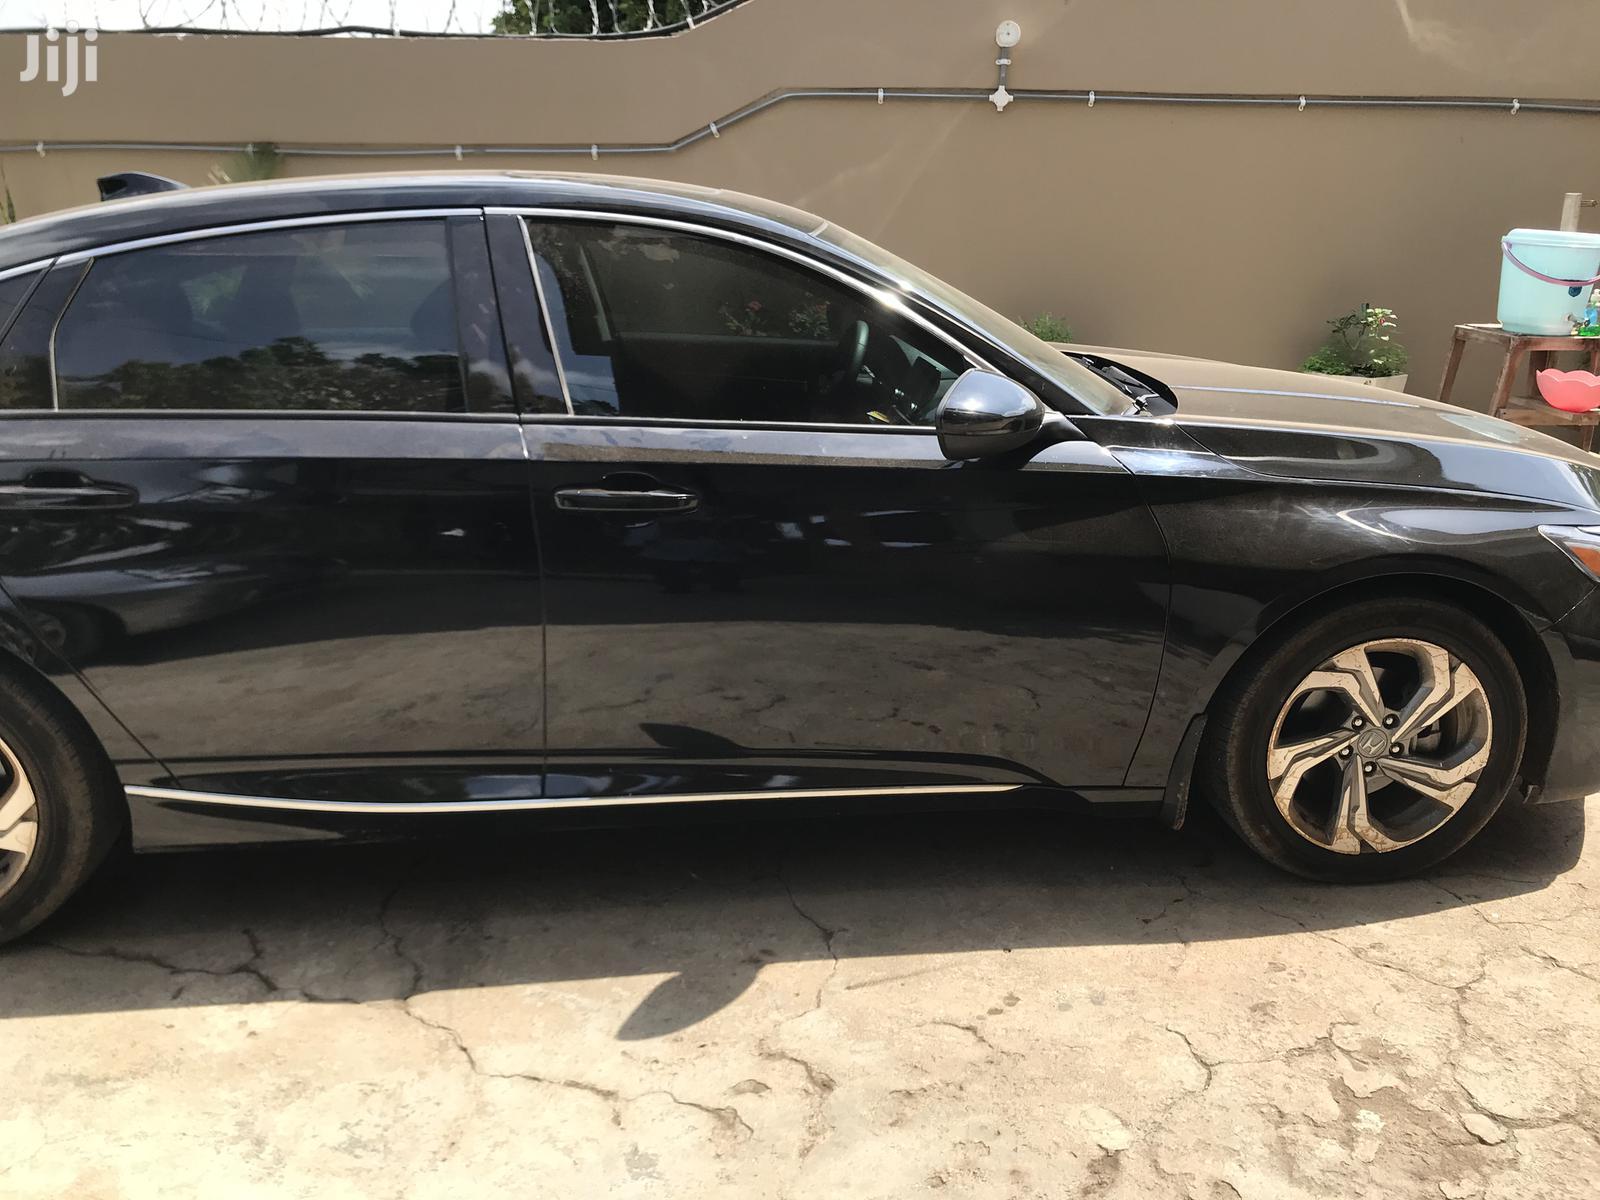 Archive Honda Accord Touring 2018 Black In Accra Metropolitan Cars Jiji User Jiji Com Gh